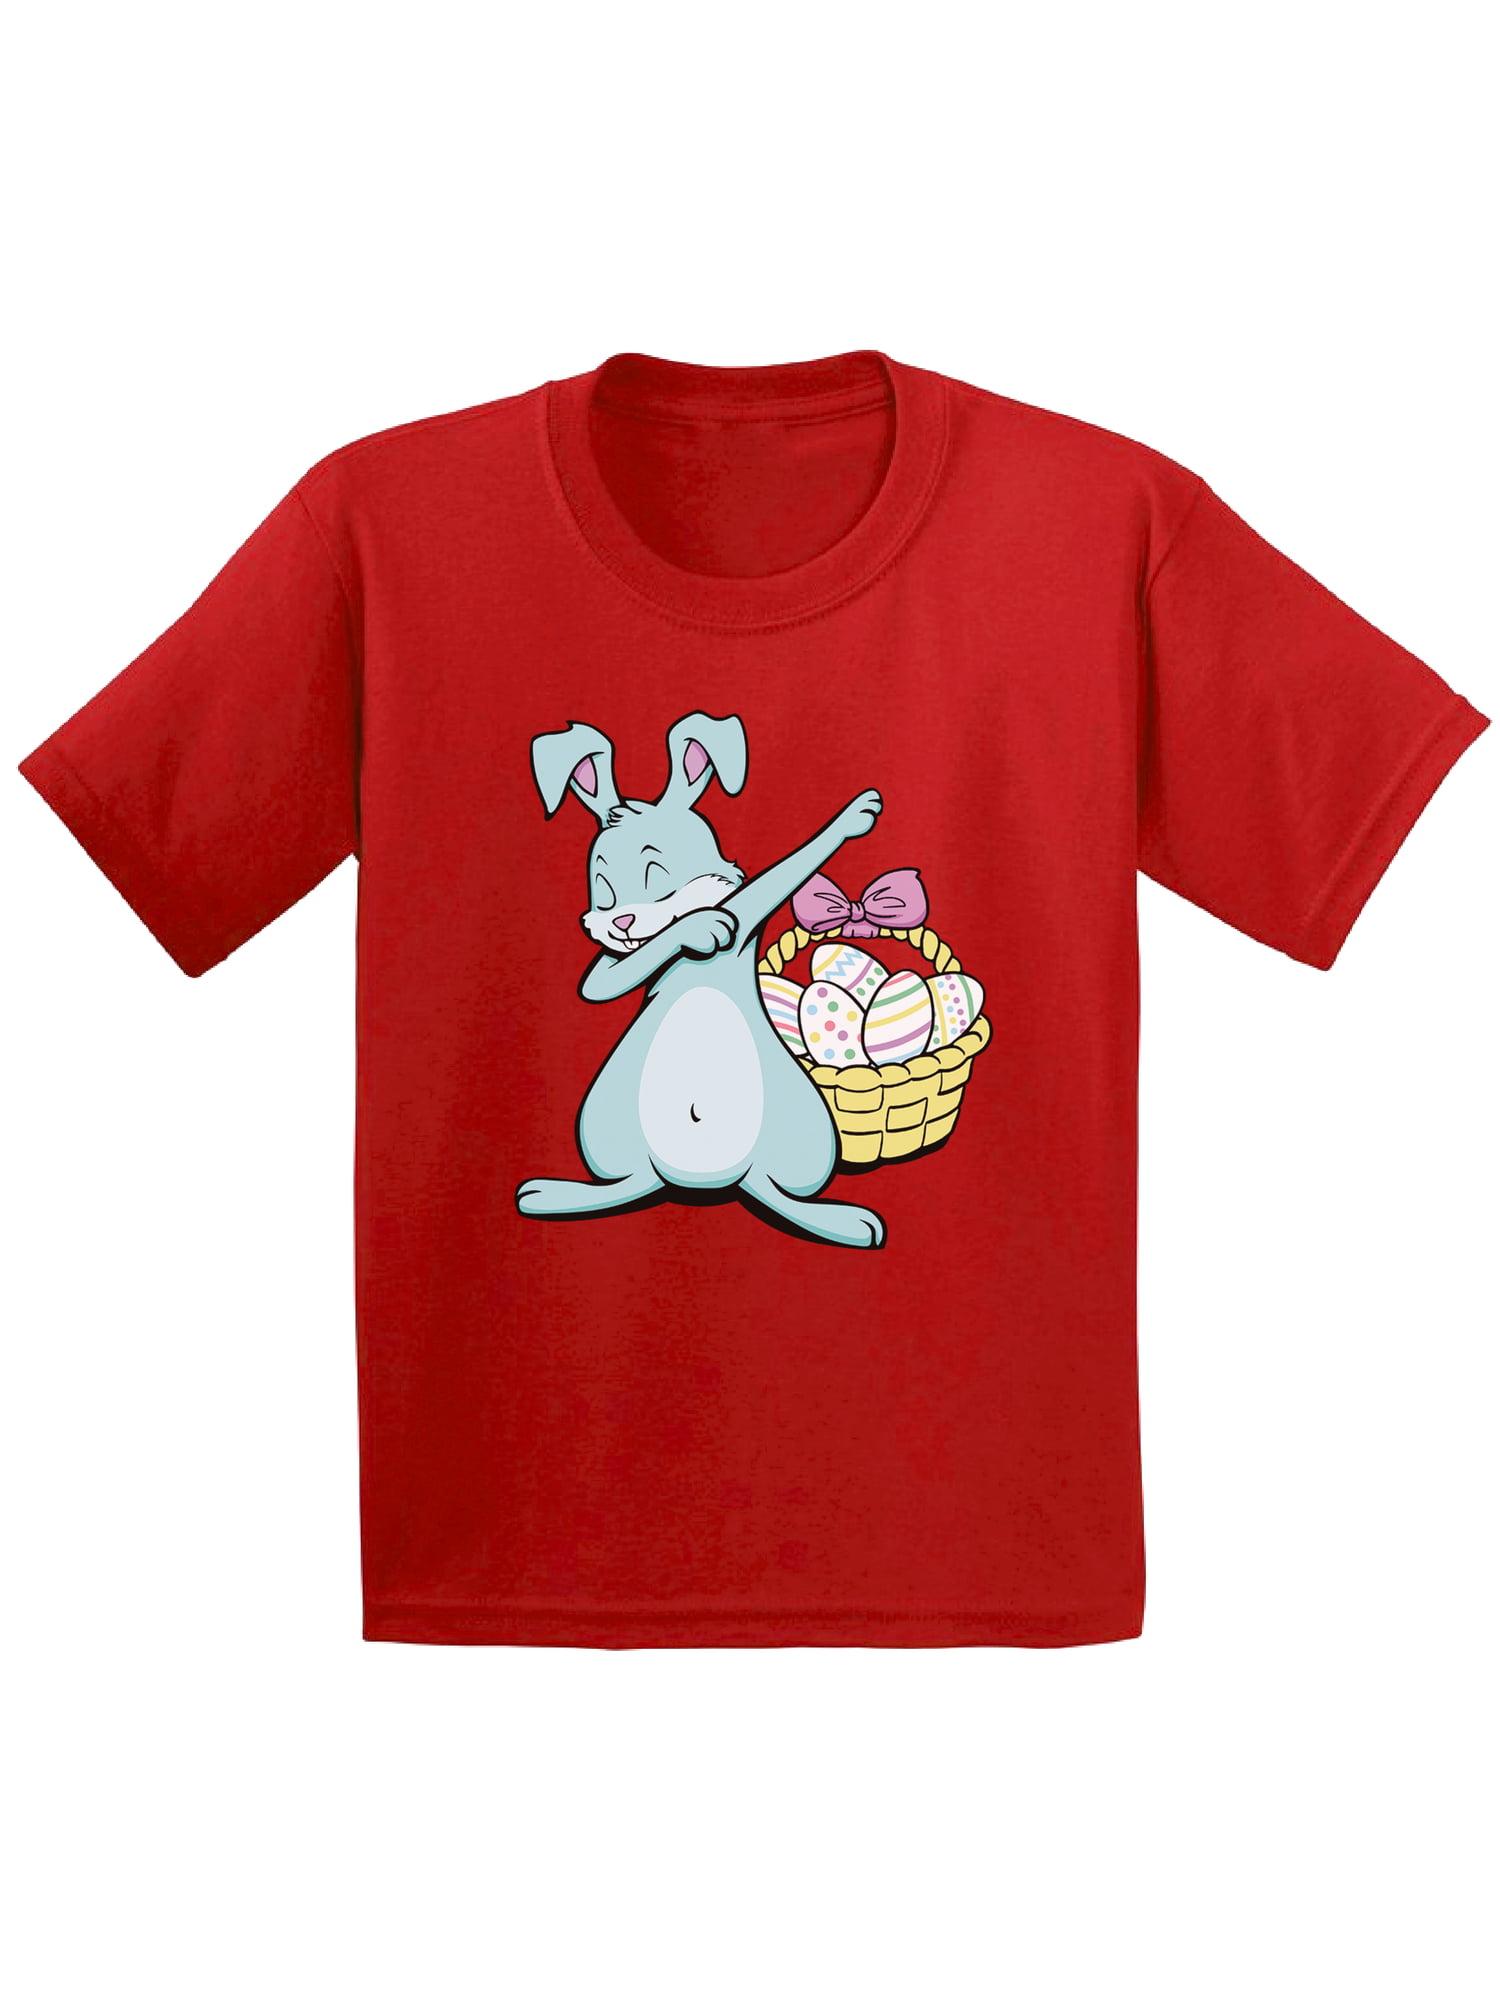 Awkward Styles Dabbing Easter Bunny Shirt for Toddlers Easter Bunny Tshirt Easter Shirt for Boys Happy Easter Easter Gifts for Girls Easter Bunny T Shirts Easter Holiday Shirts Easter Basket Stuffers